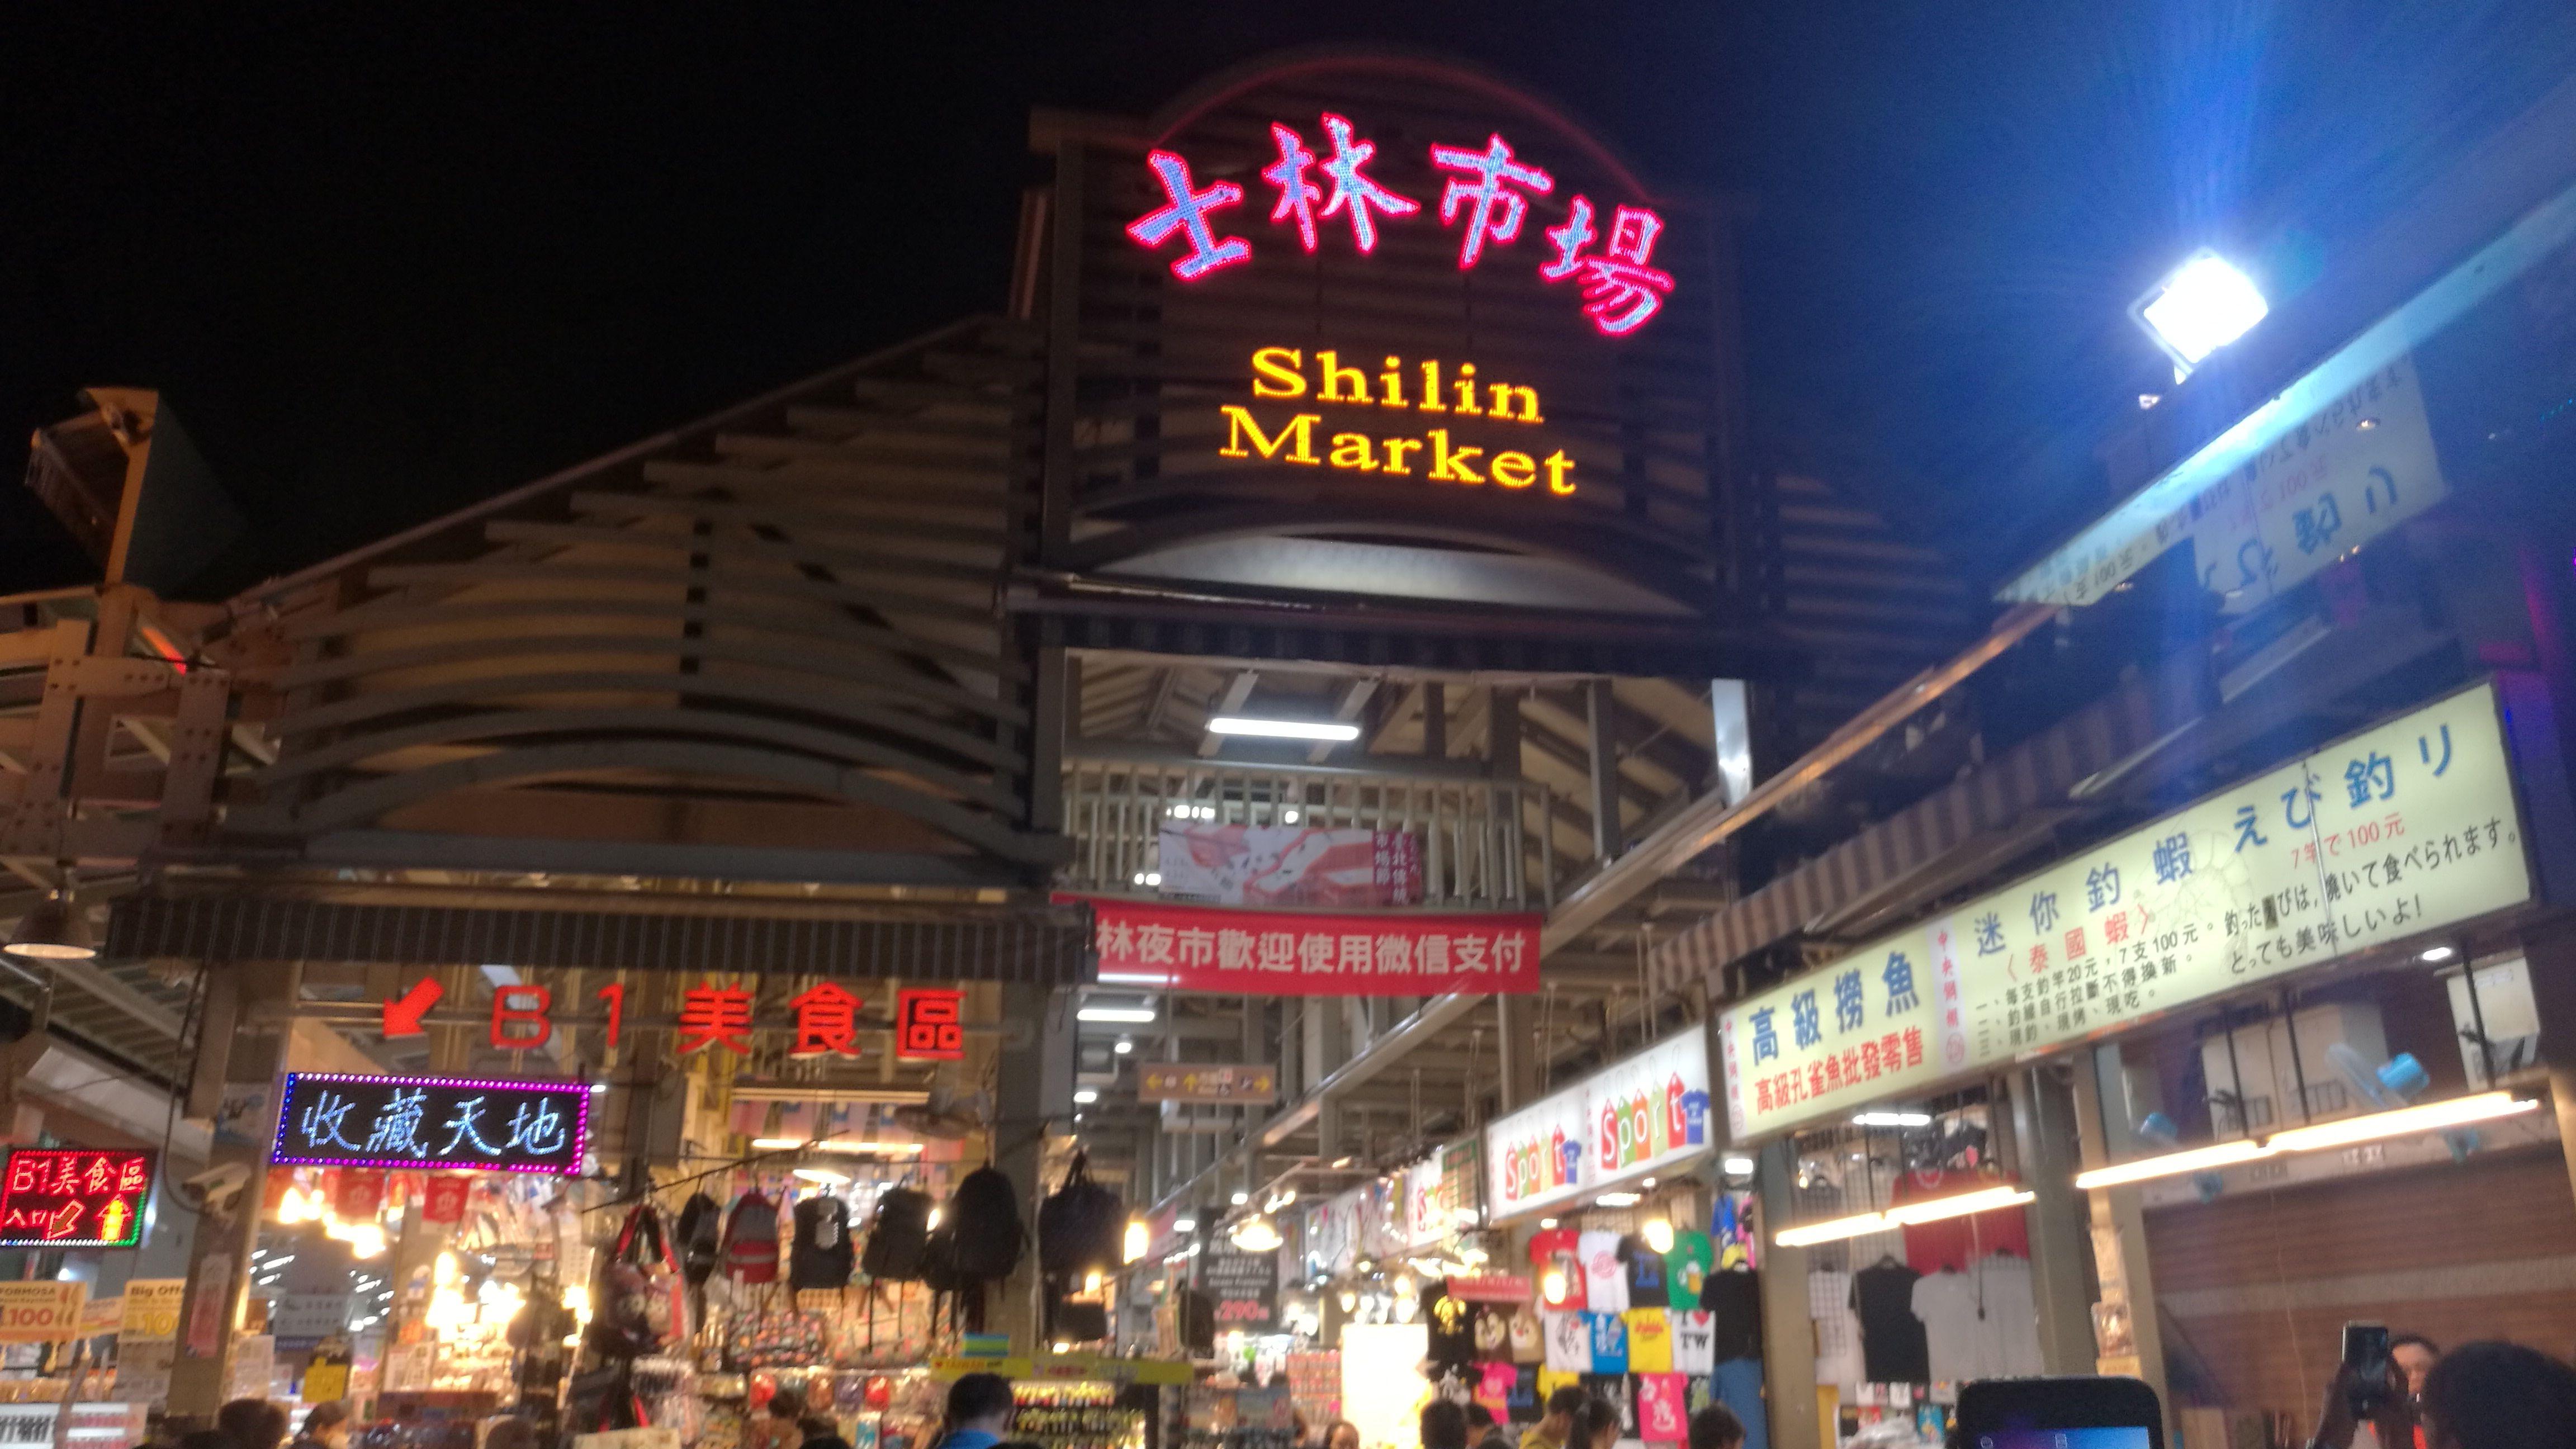 Entrada a Shilling market, Taipei